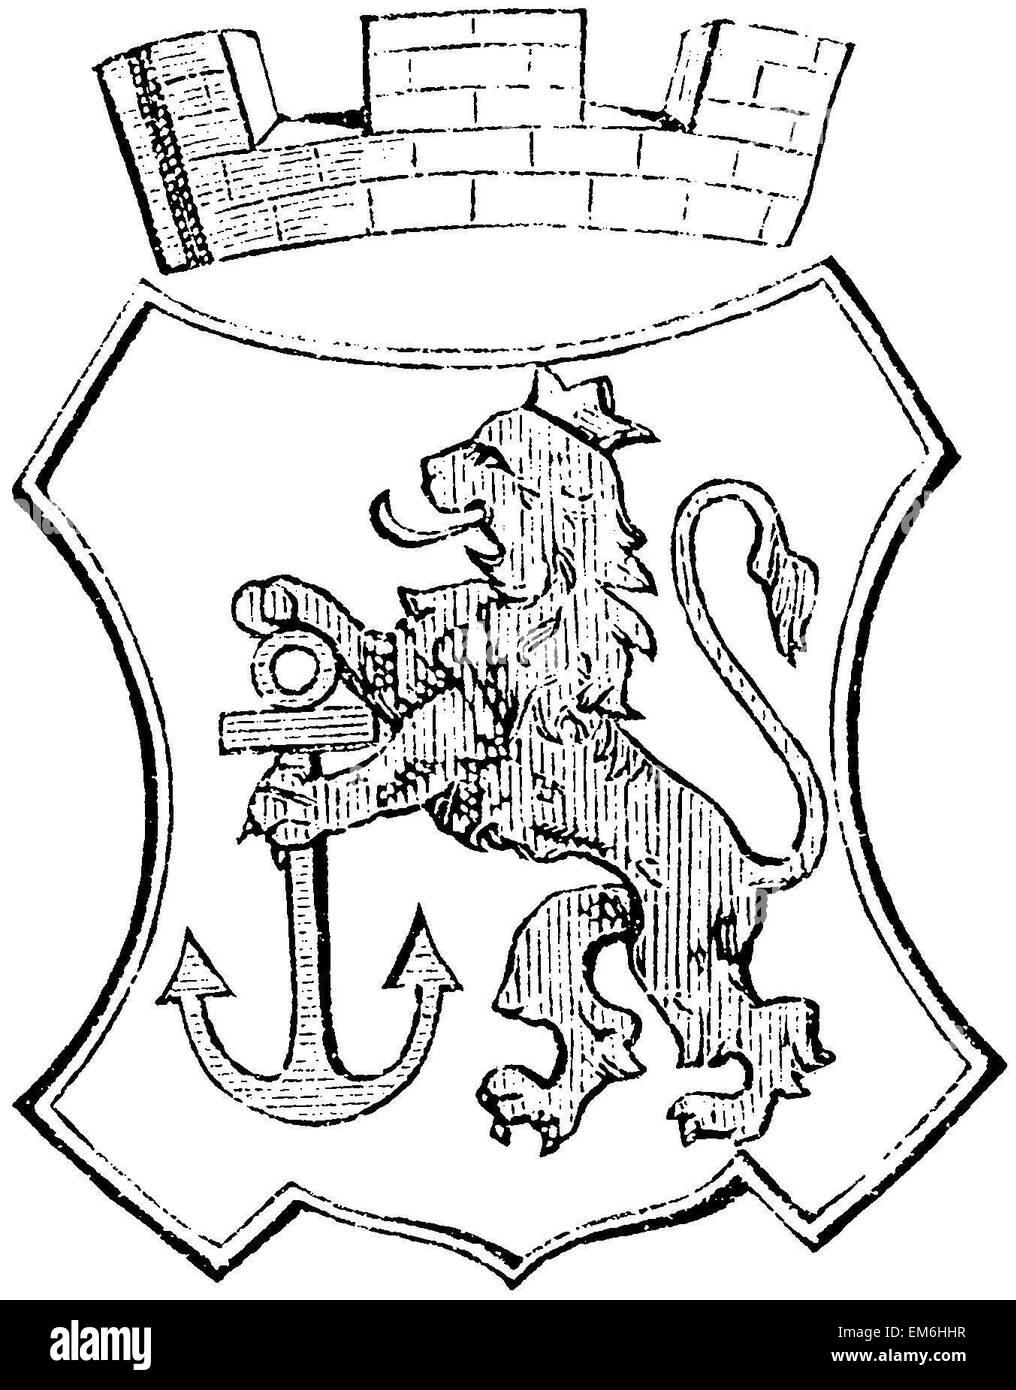 Coat Of Arms Of Dusseldorf Stock Photo 81280131 Alamy